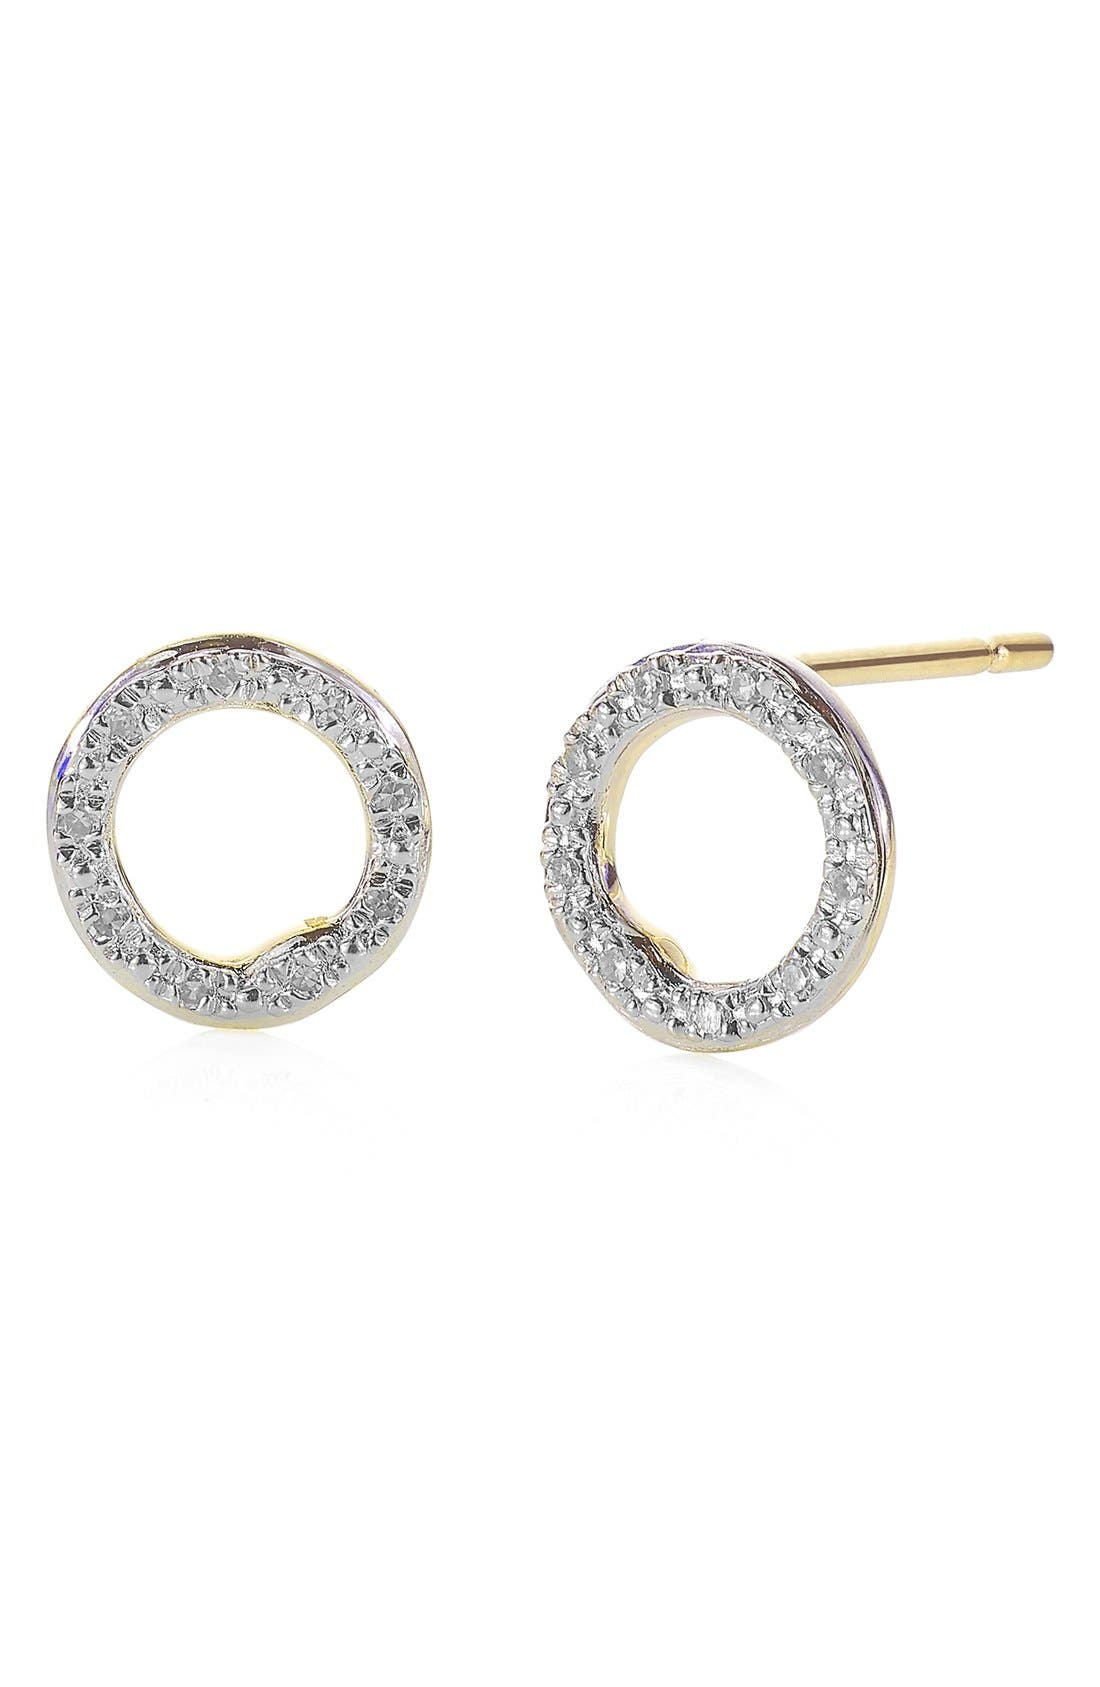 Alternate Image 1 Selected - Monica Vinader 'Riva' Circle Stud Diamond Earrings